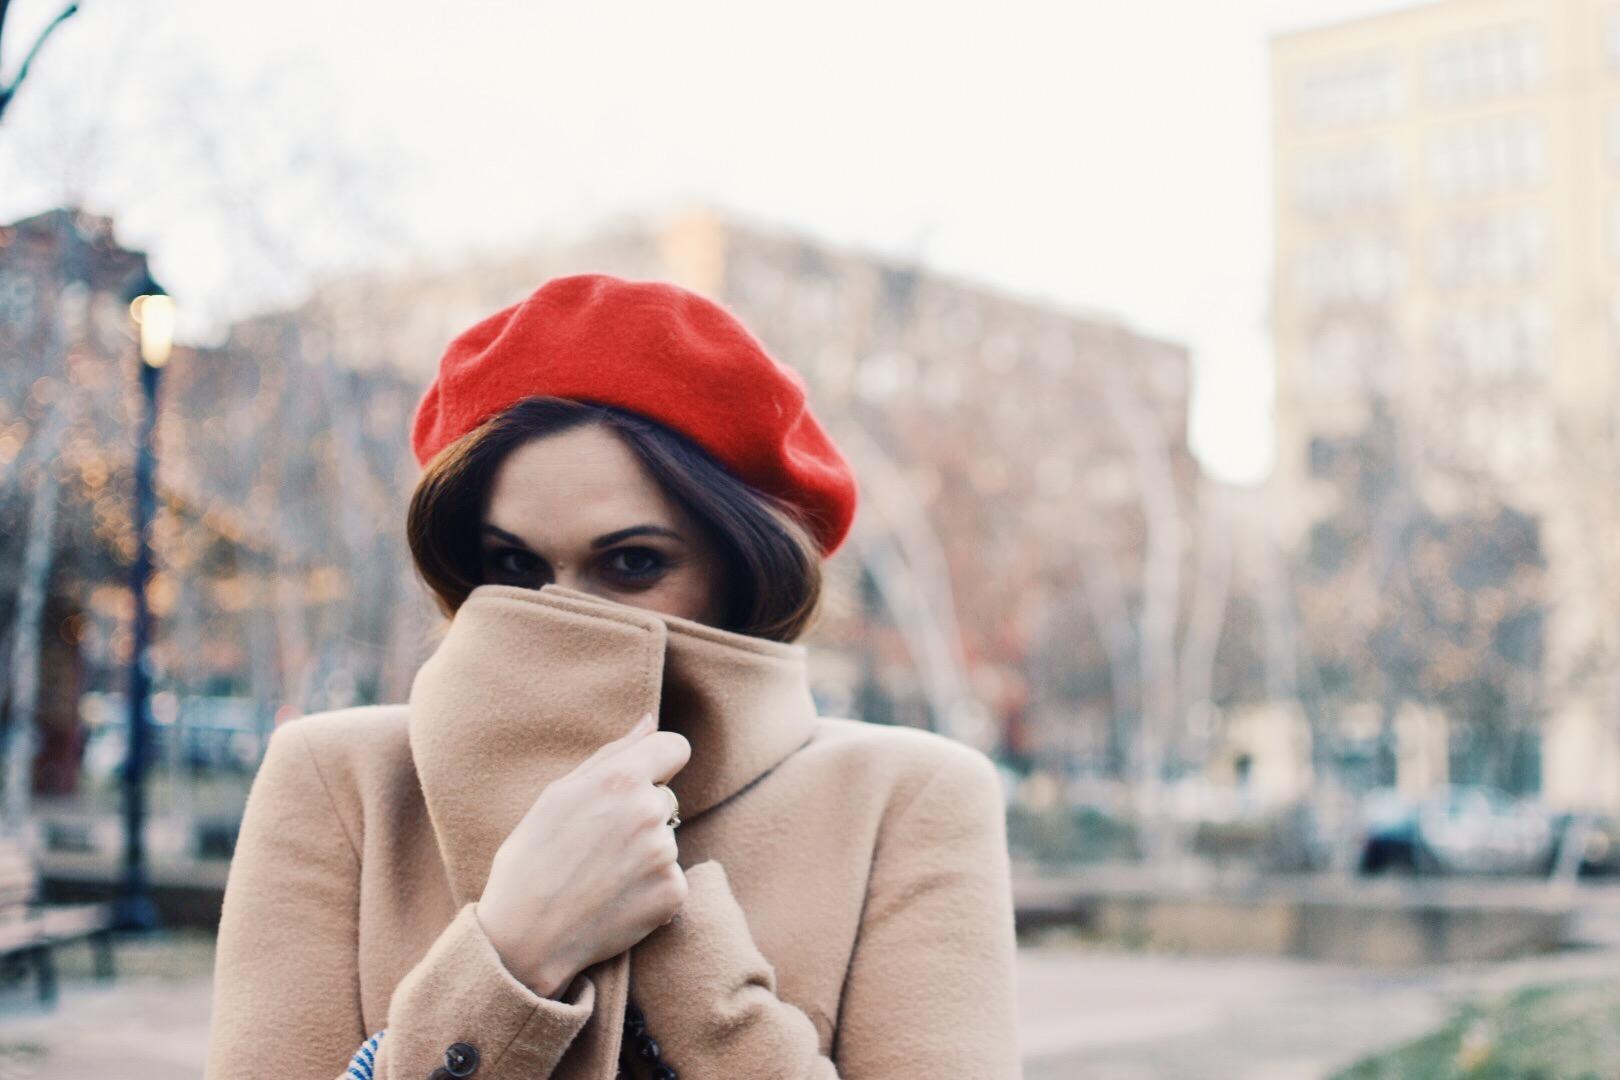 jess burke well layered personal wardrobe stylist minneapolis easy ways to look effortlessly chic personal shopper.JPG